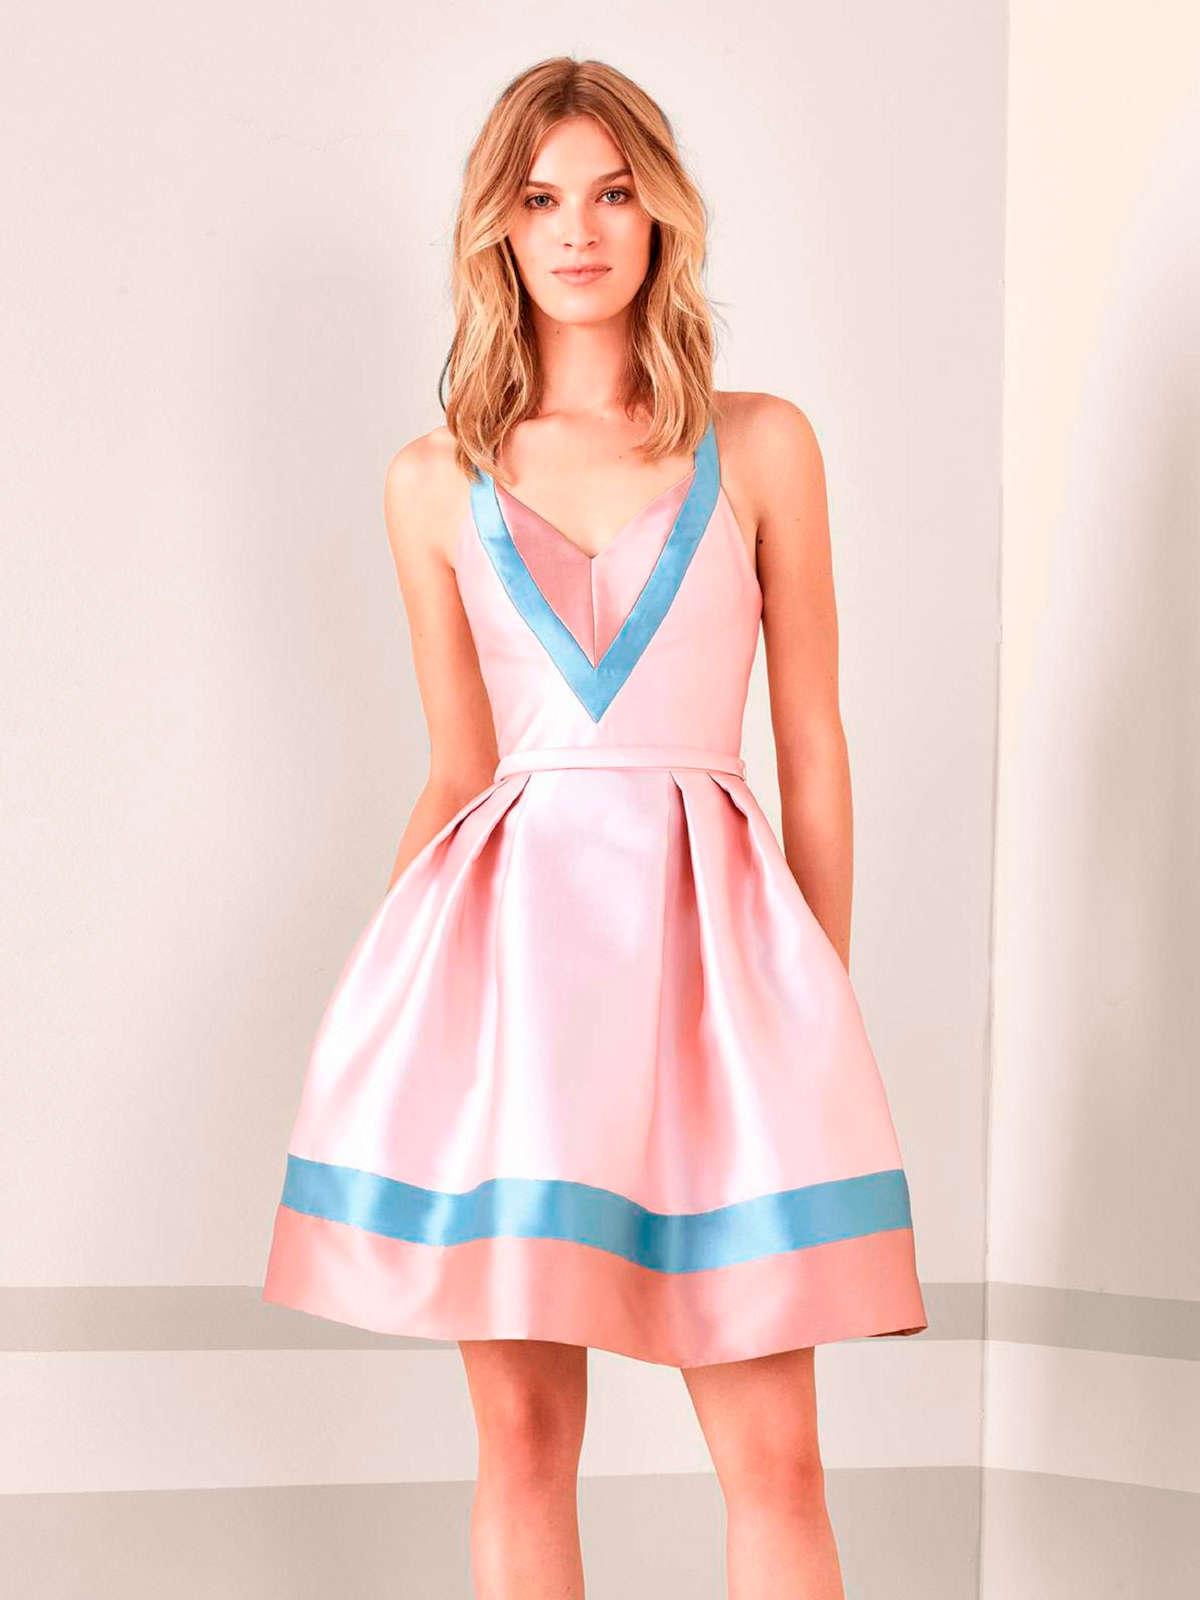 Comprar Vestidos de fiesta largos barato en Zaragoza - Ofertia